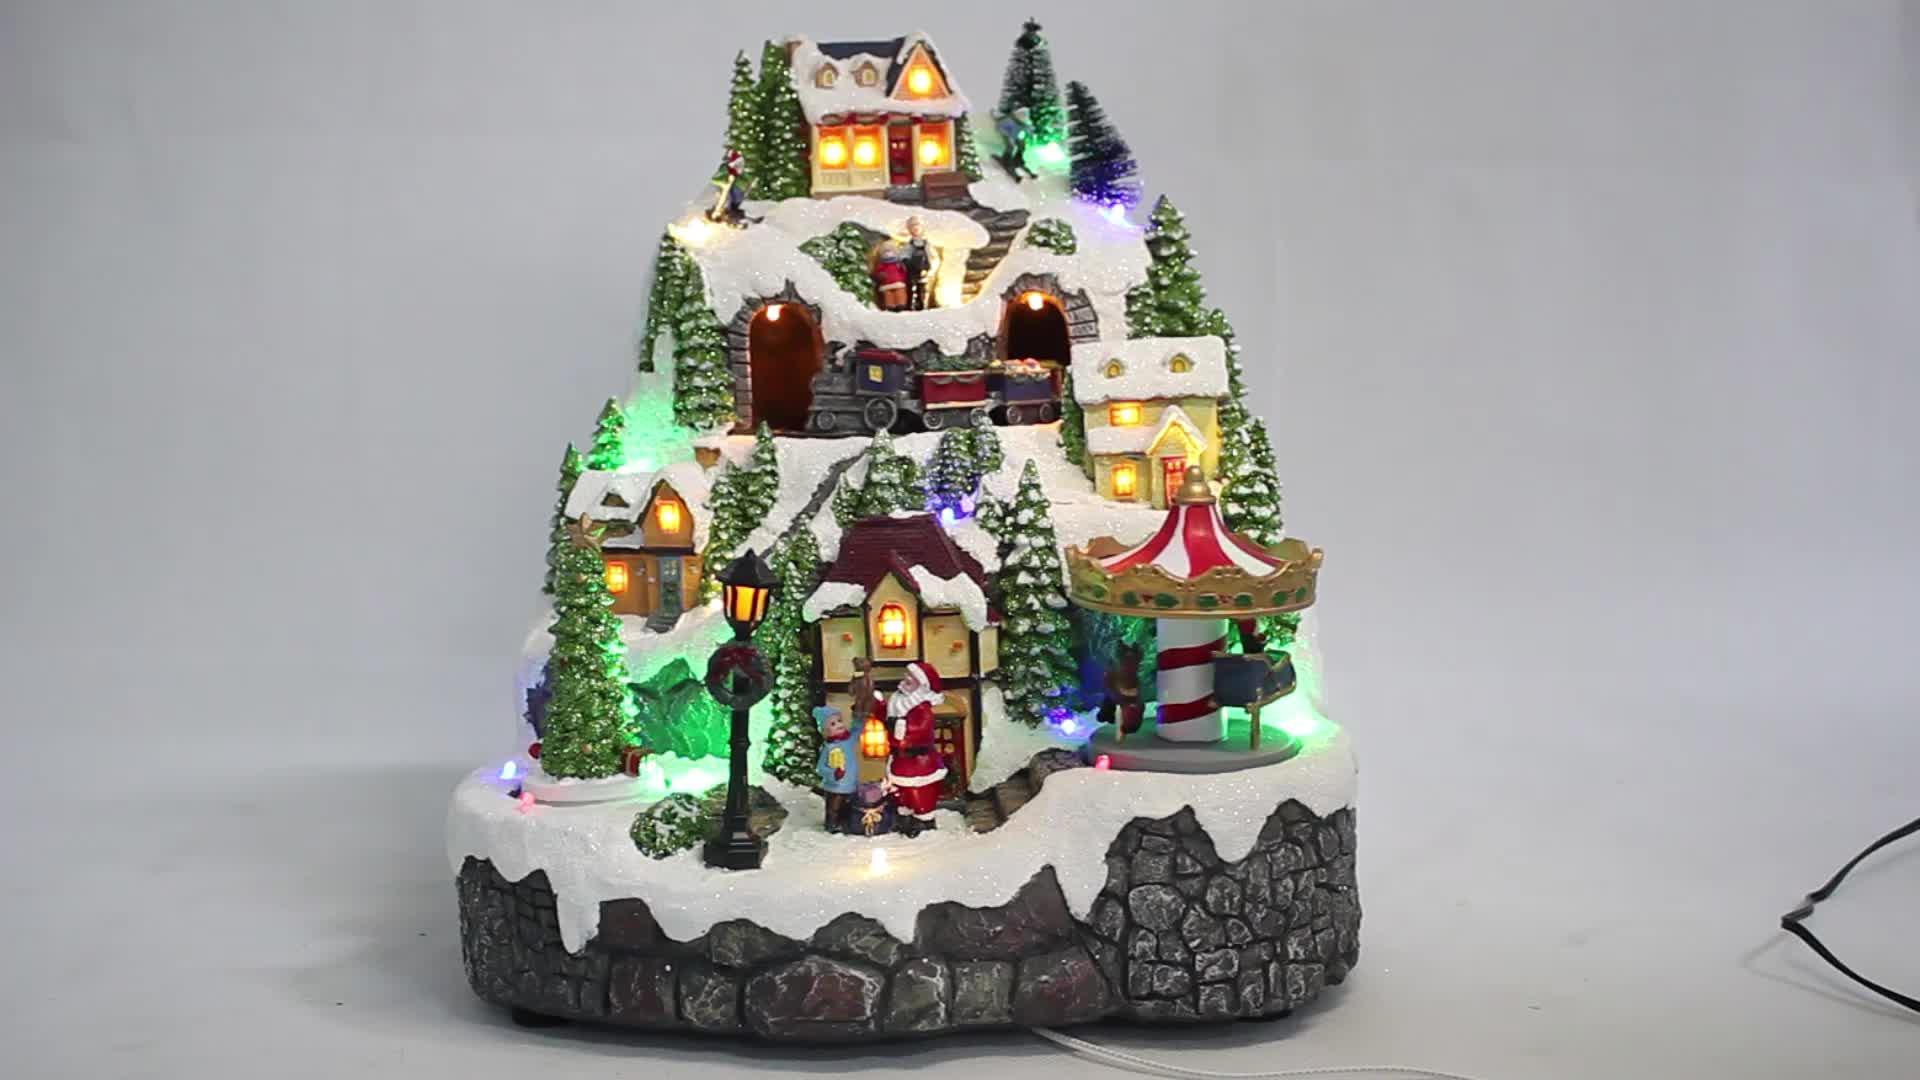 Custom magic eco lo wes polyresin lemax animierte led musical zug Weihnachten dorf haus